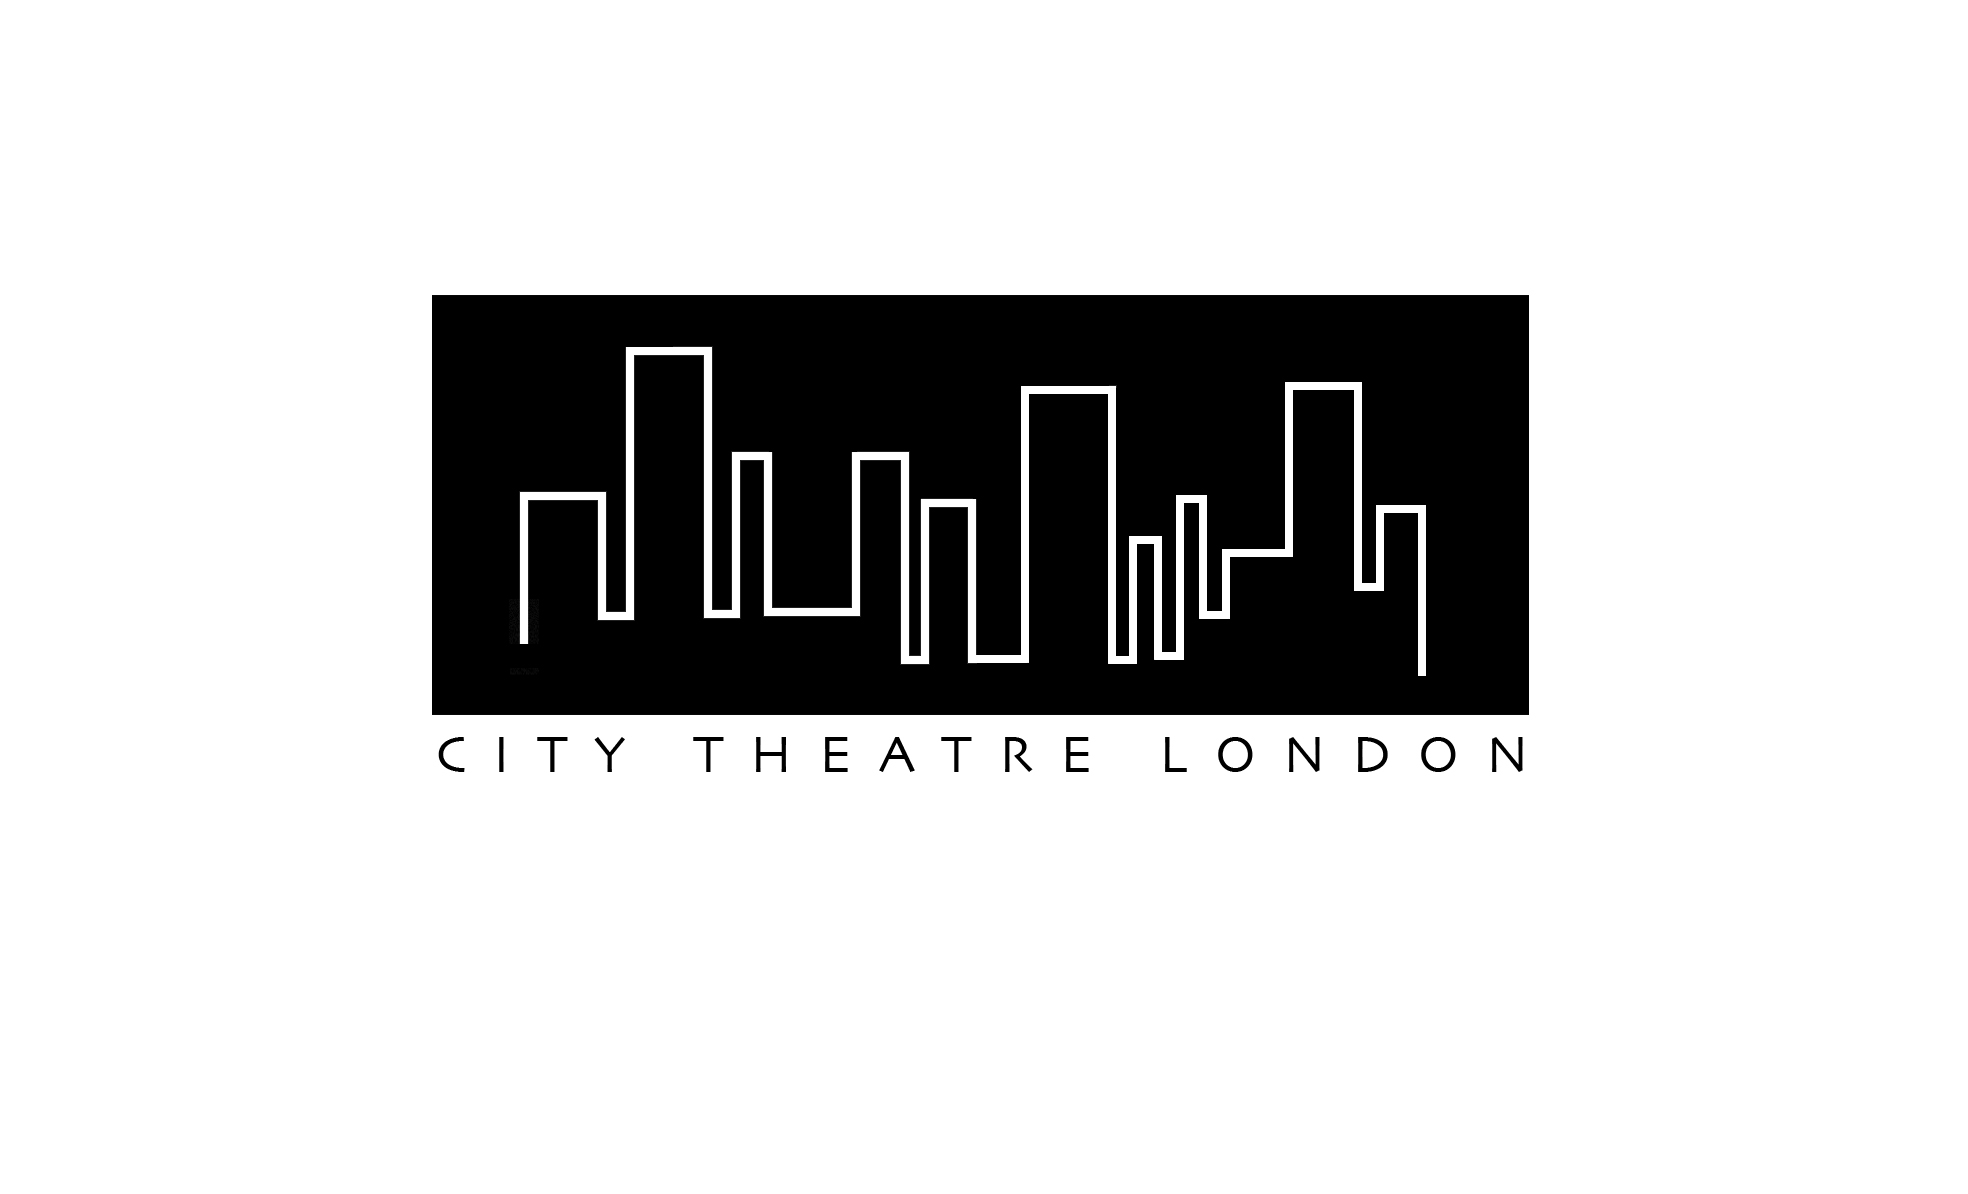 city-theatre-logo-design7